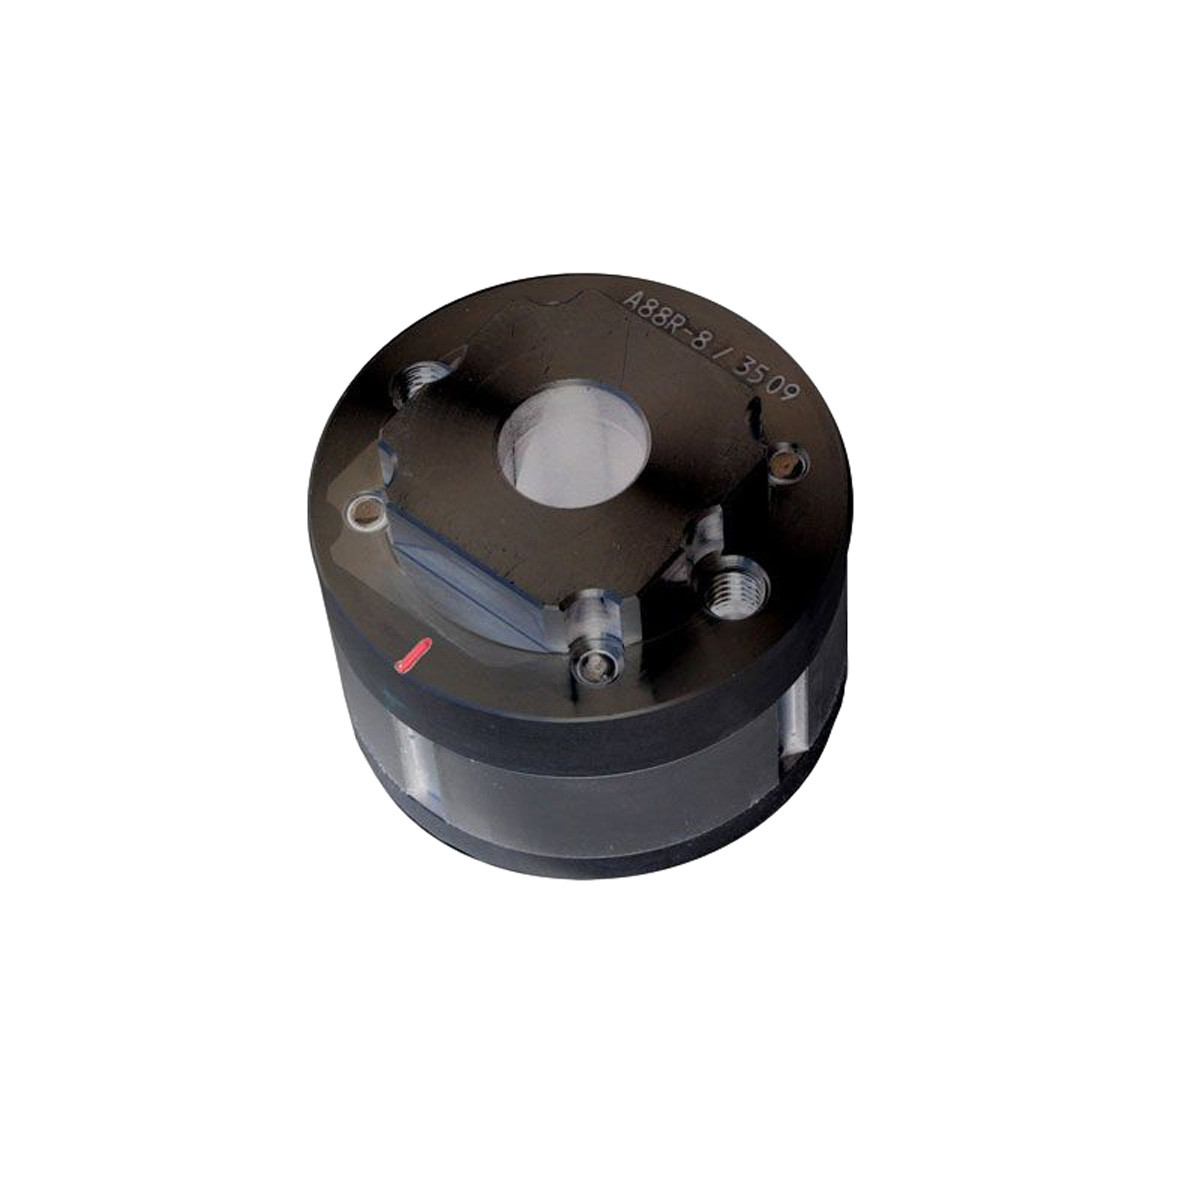 Rotor Allumage PEUGEOT 103 6V à Rupteurs - MVT Digital Direct DD02